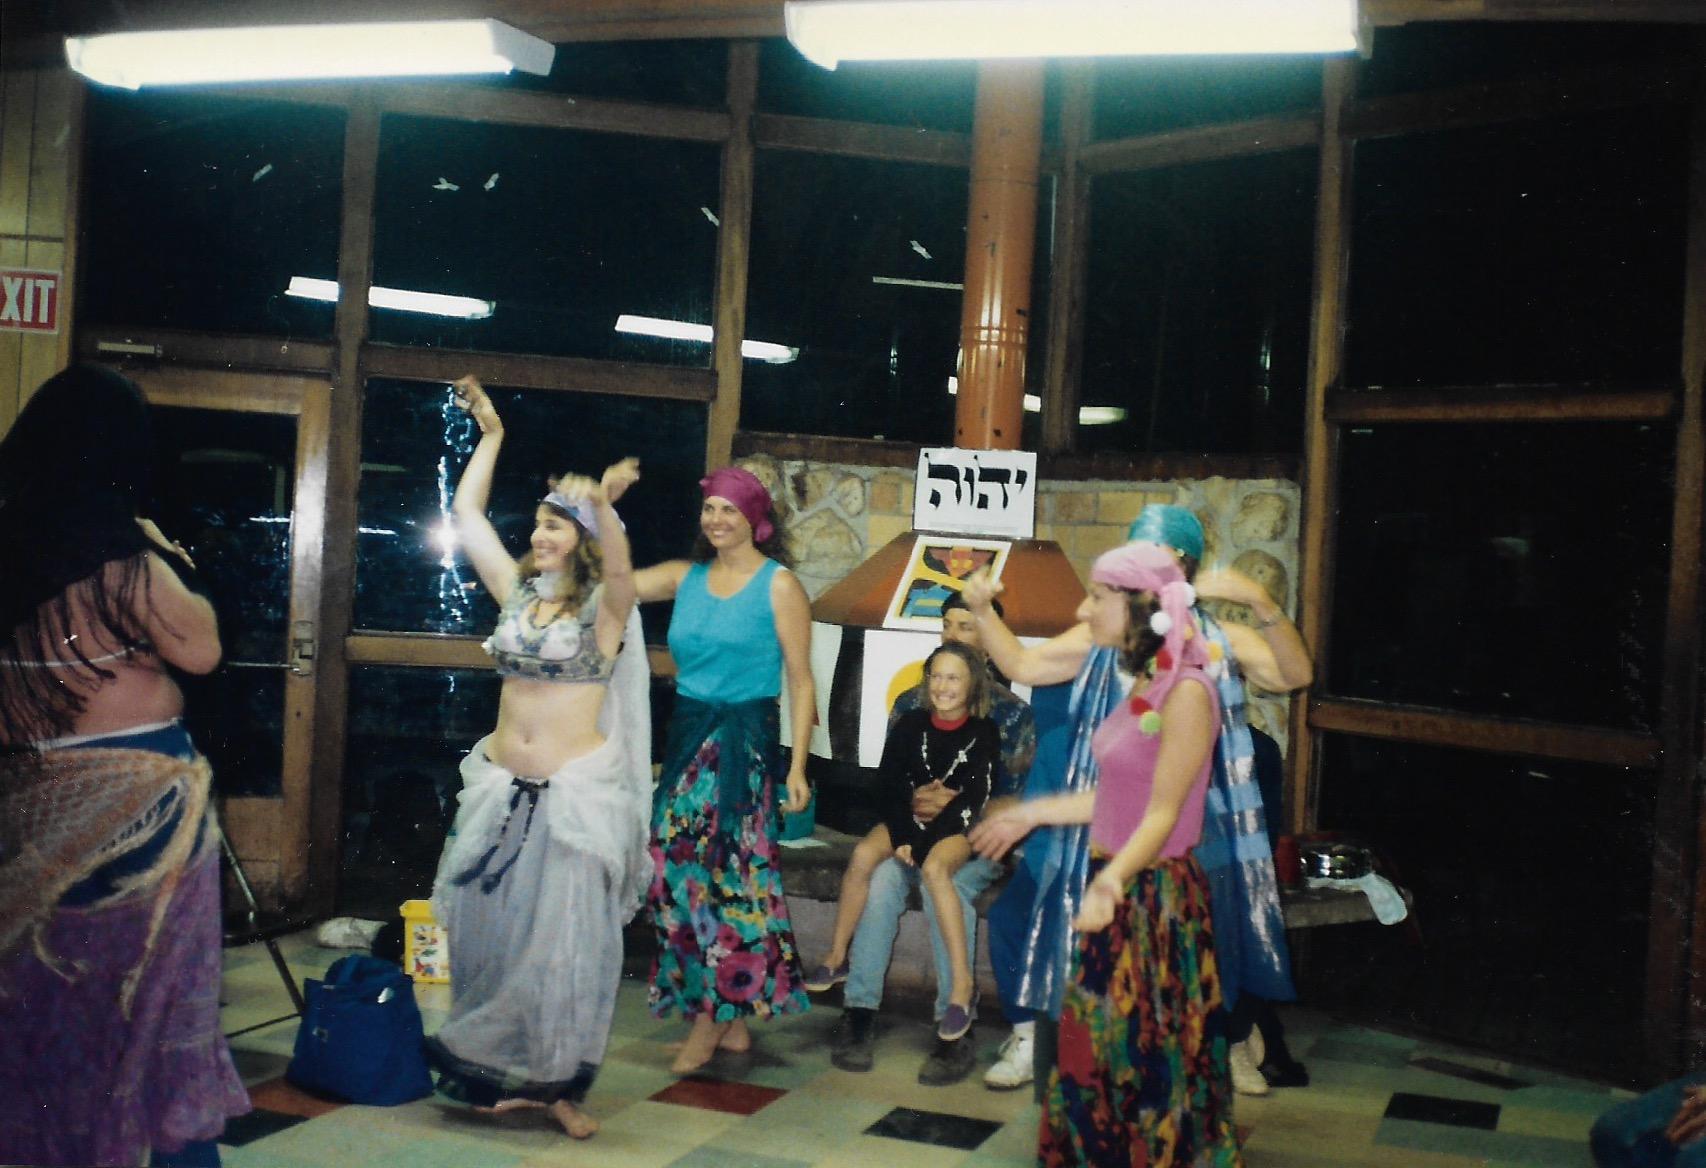 92 Joys  Saturday night belly dancing performance led by Linda Elyad, incl Rhonda Mason, Linda Hylander(?) copy.jpeg